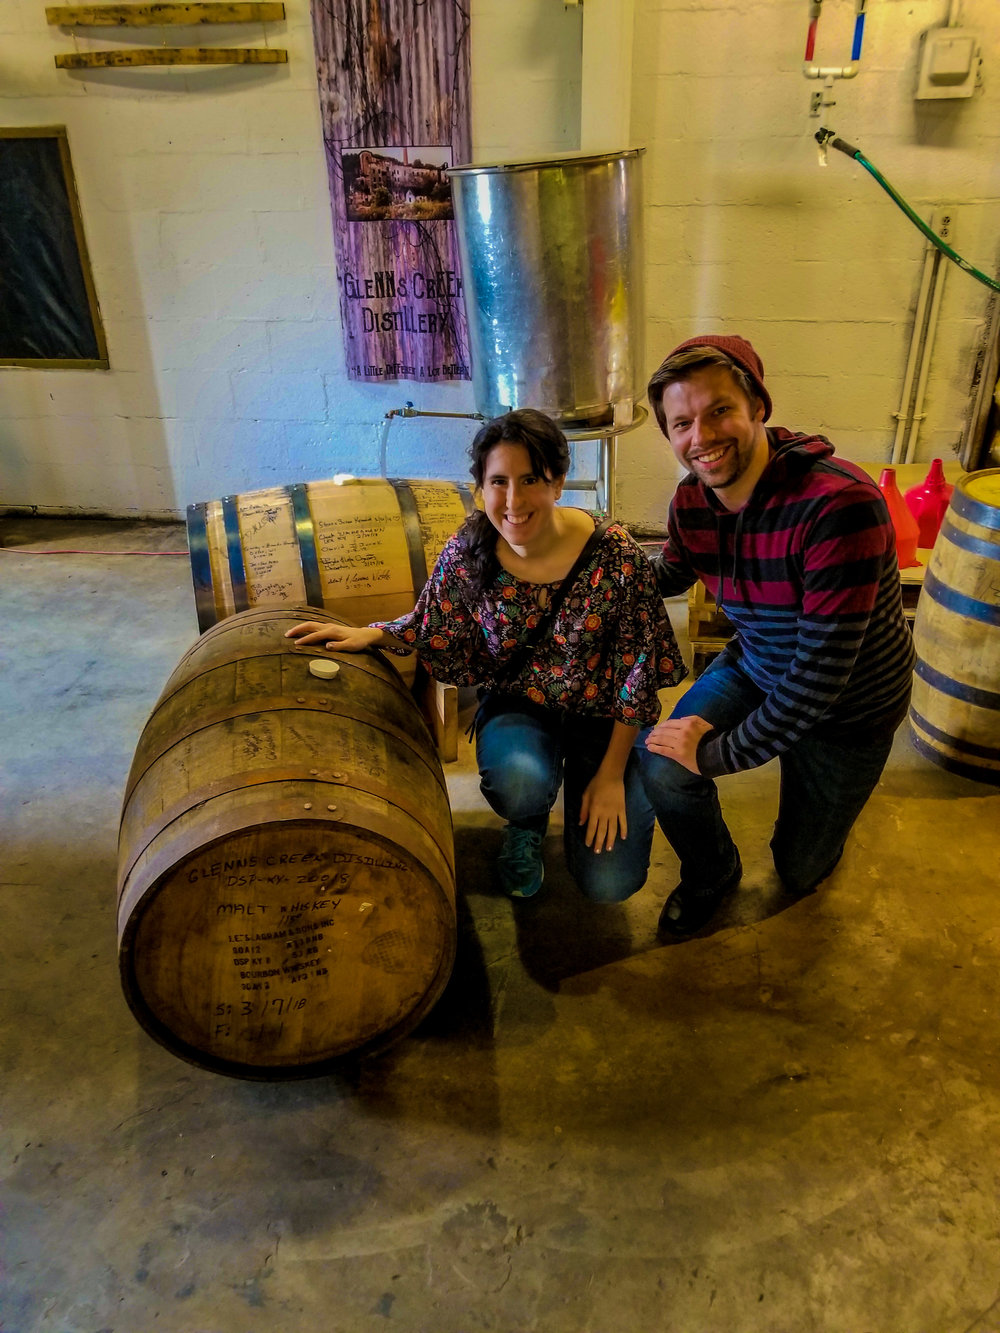 Glenns-Creek-Distillery